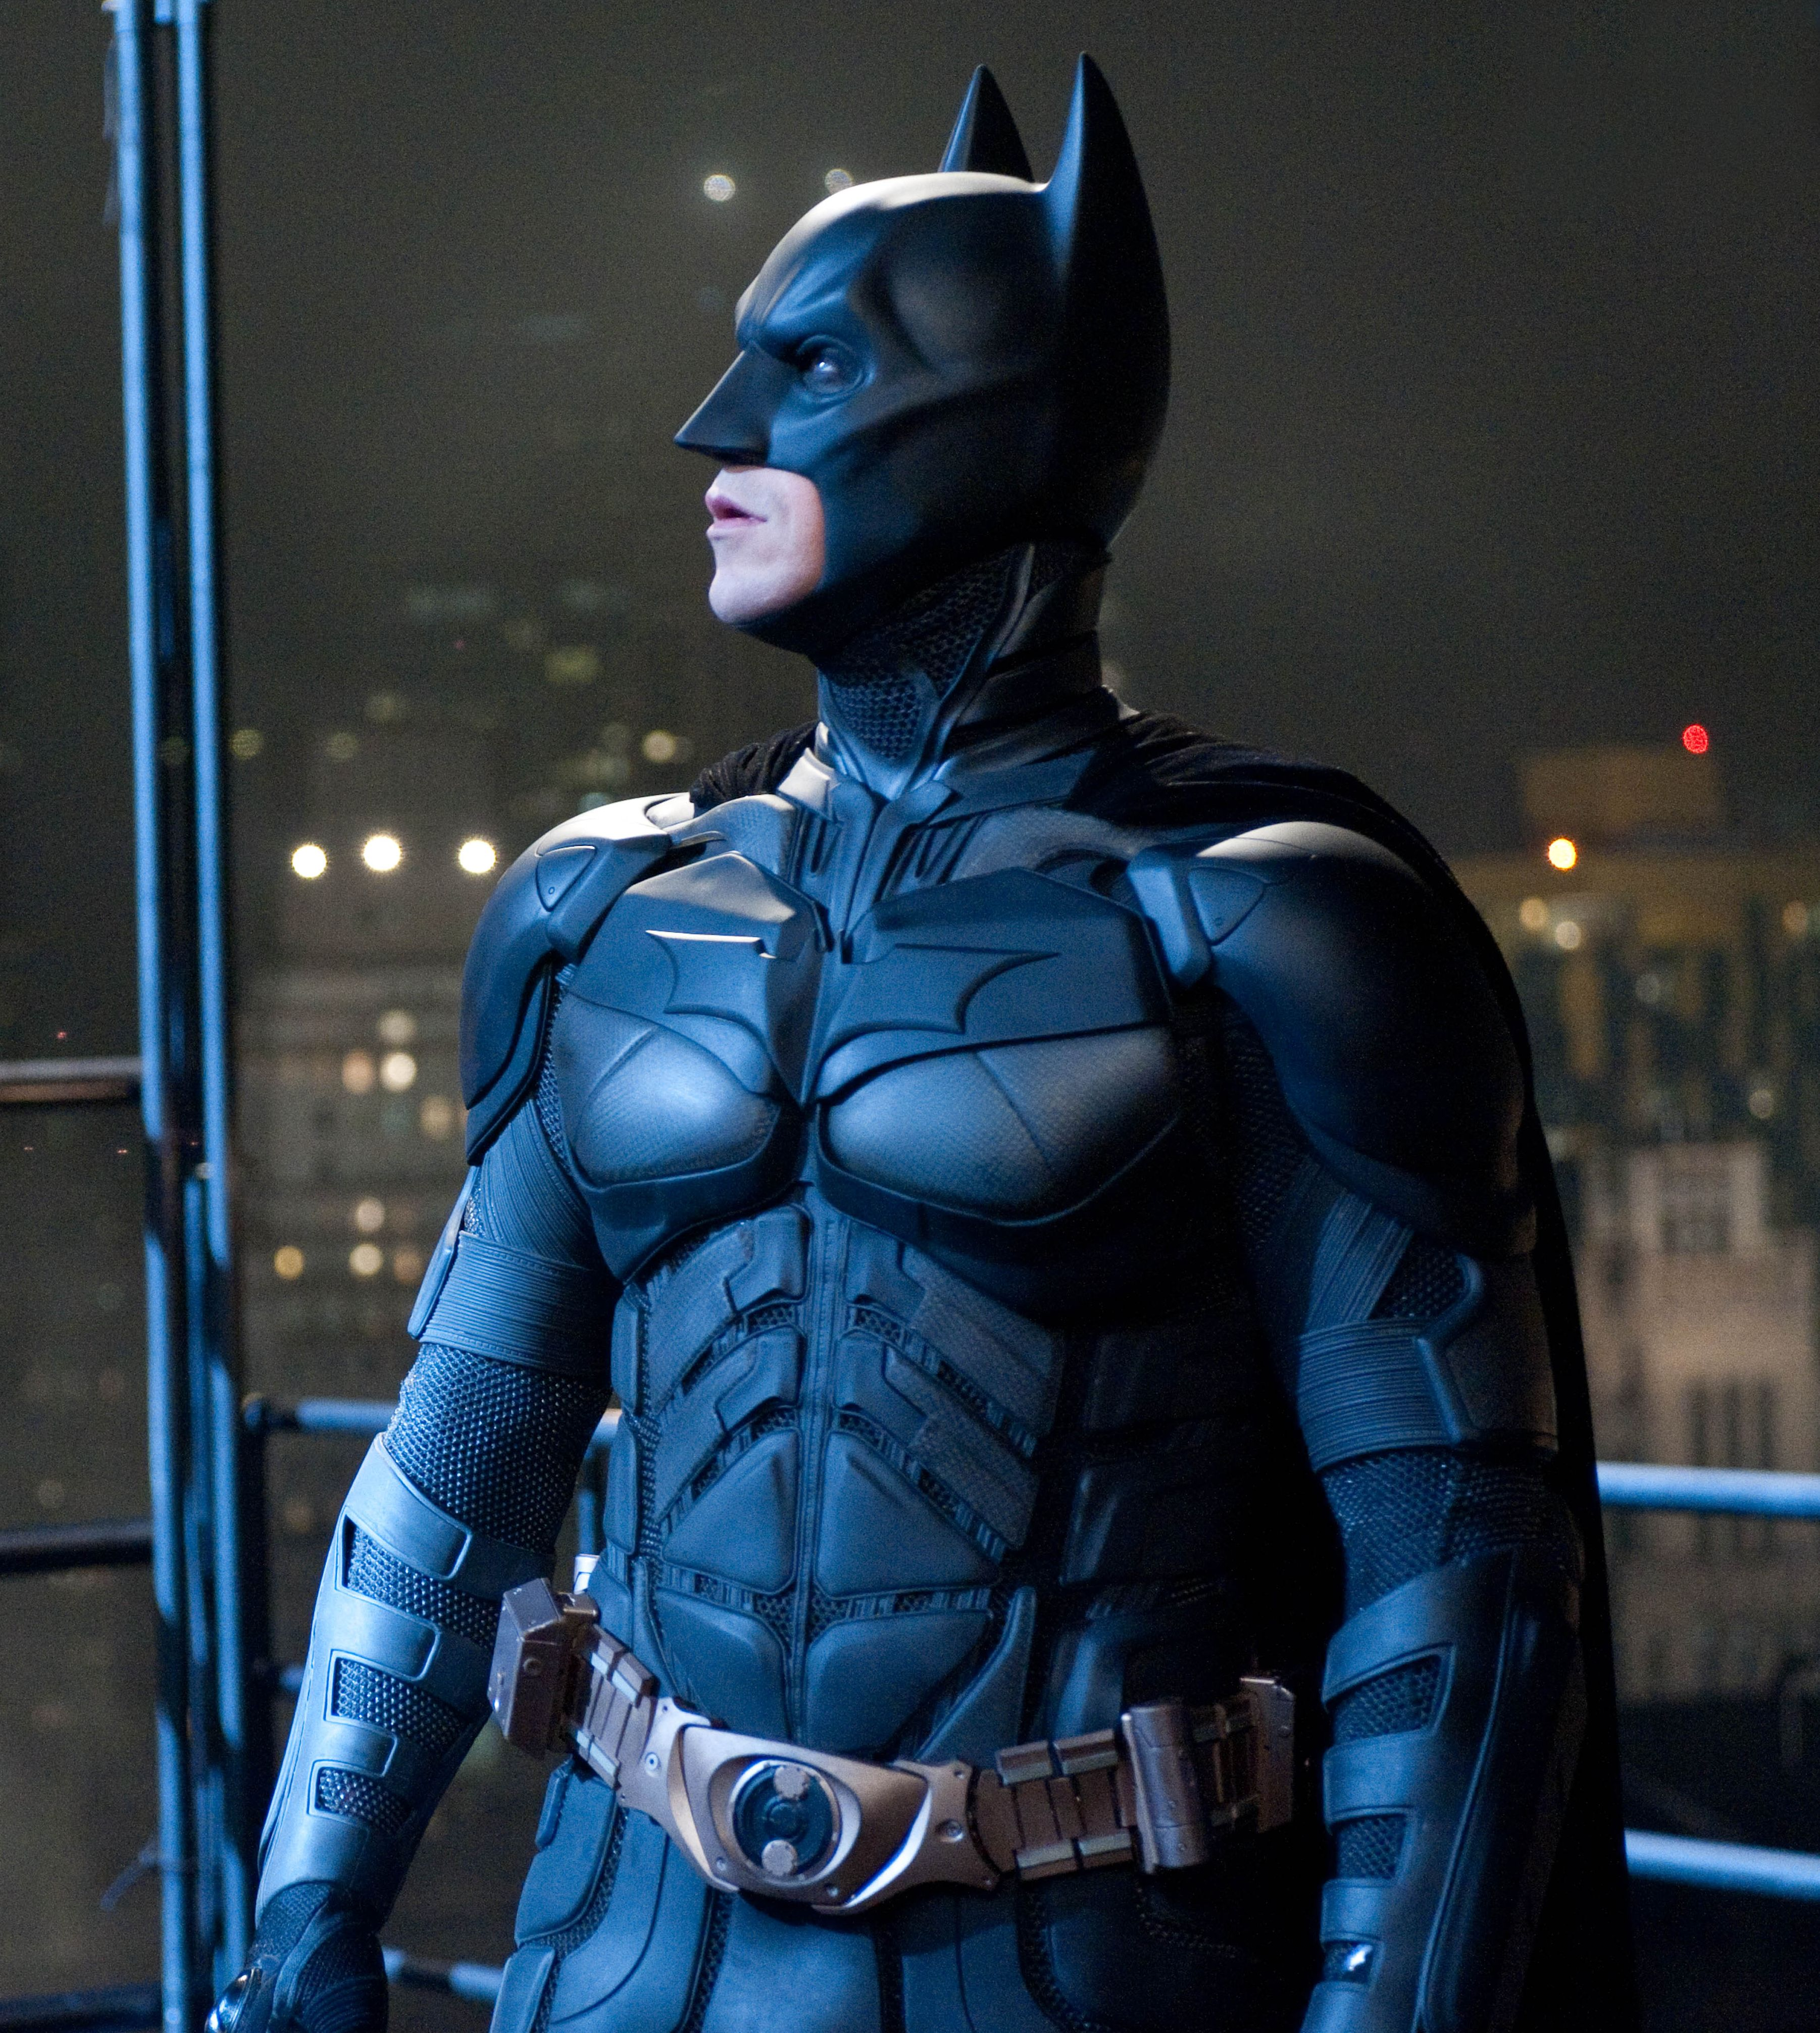 Batman looks into the sky - The Dark Knight Rises